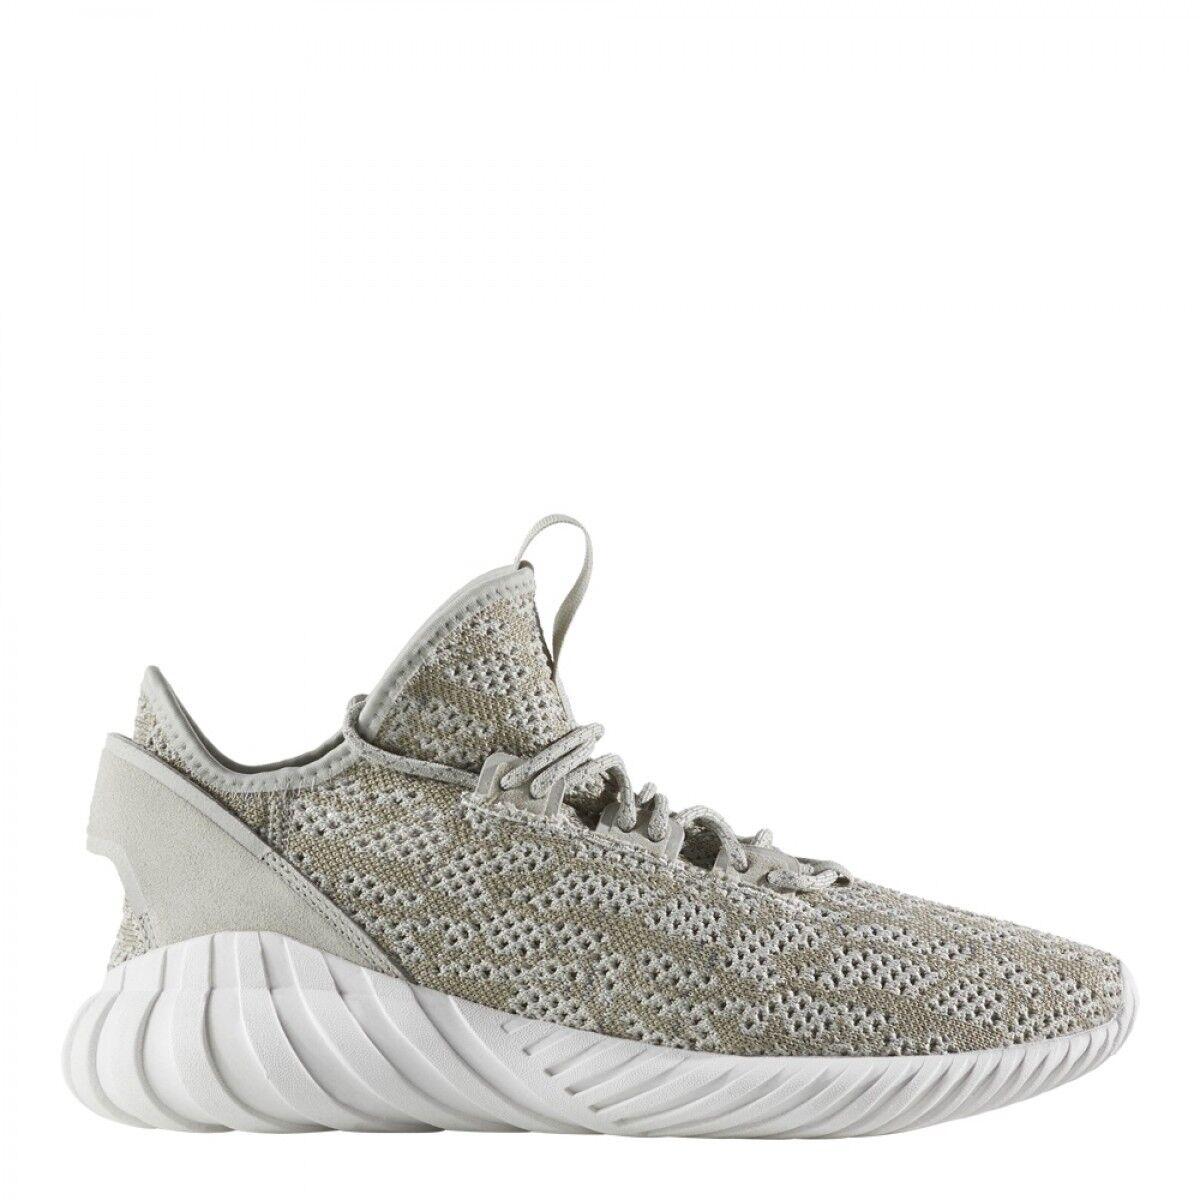 Adidas socke originals männer tubuläre doom socke Adidas primeknit authentic sesam by3561 2115be